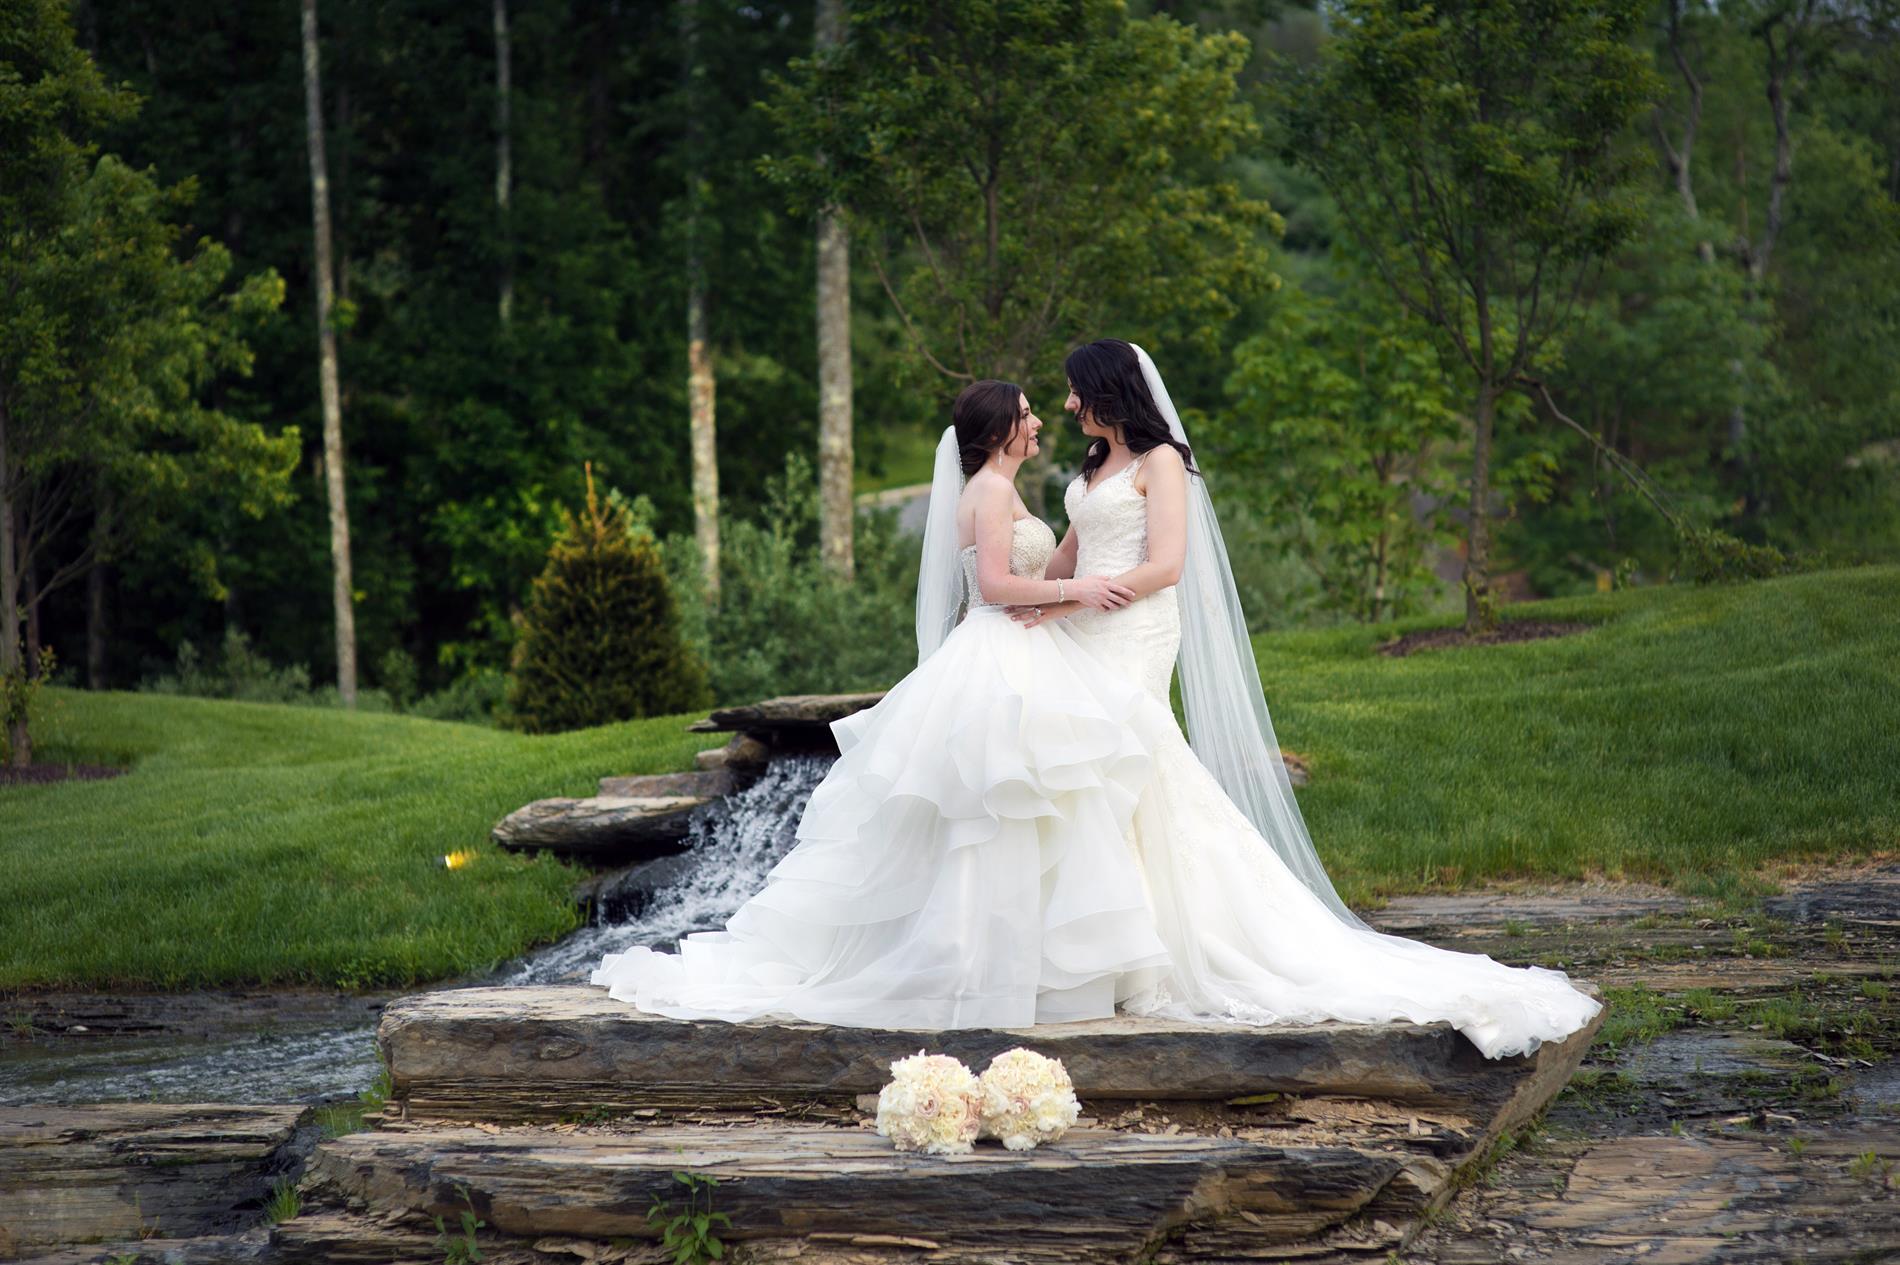 Cailin and Graciela Wedding Photos